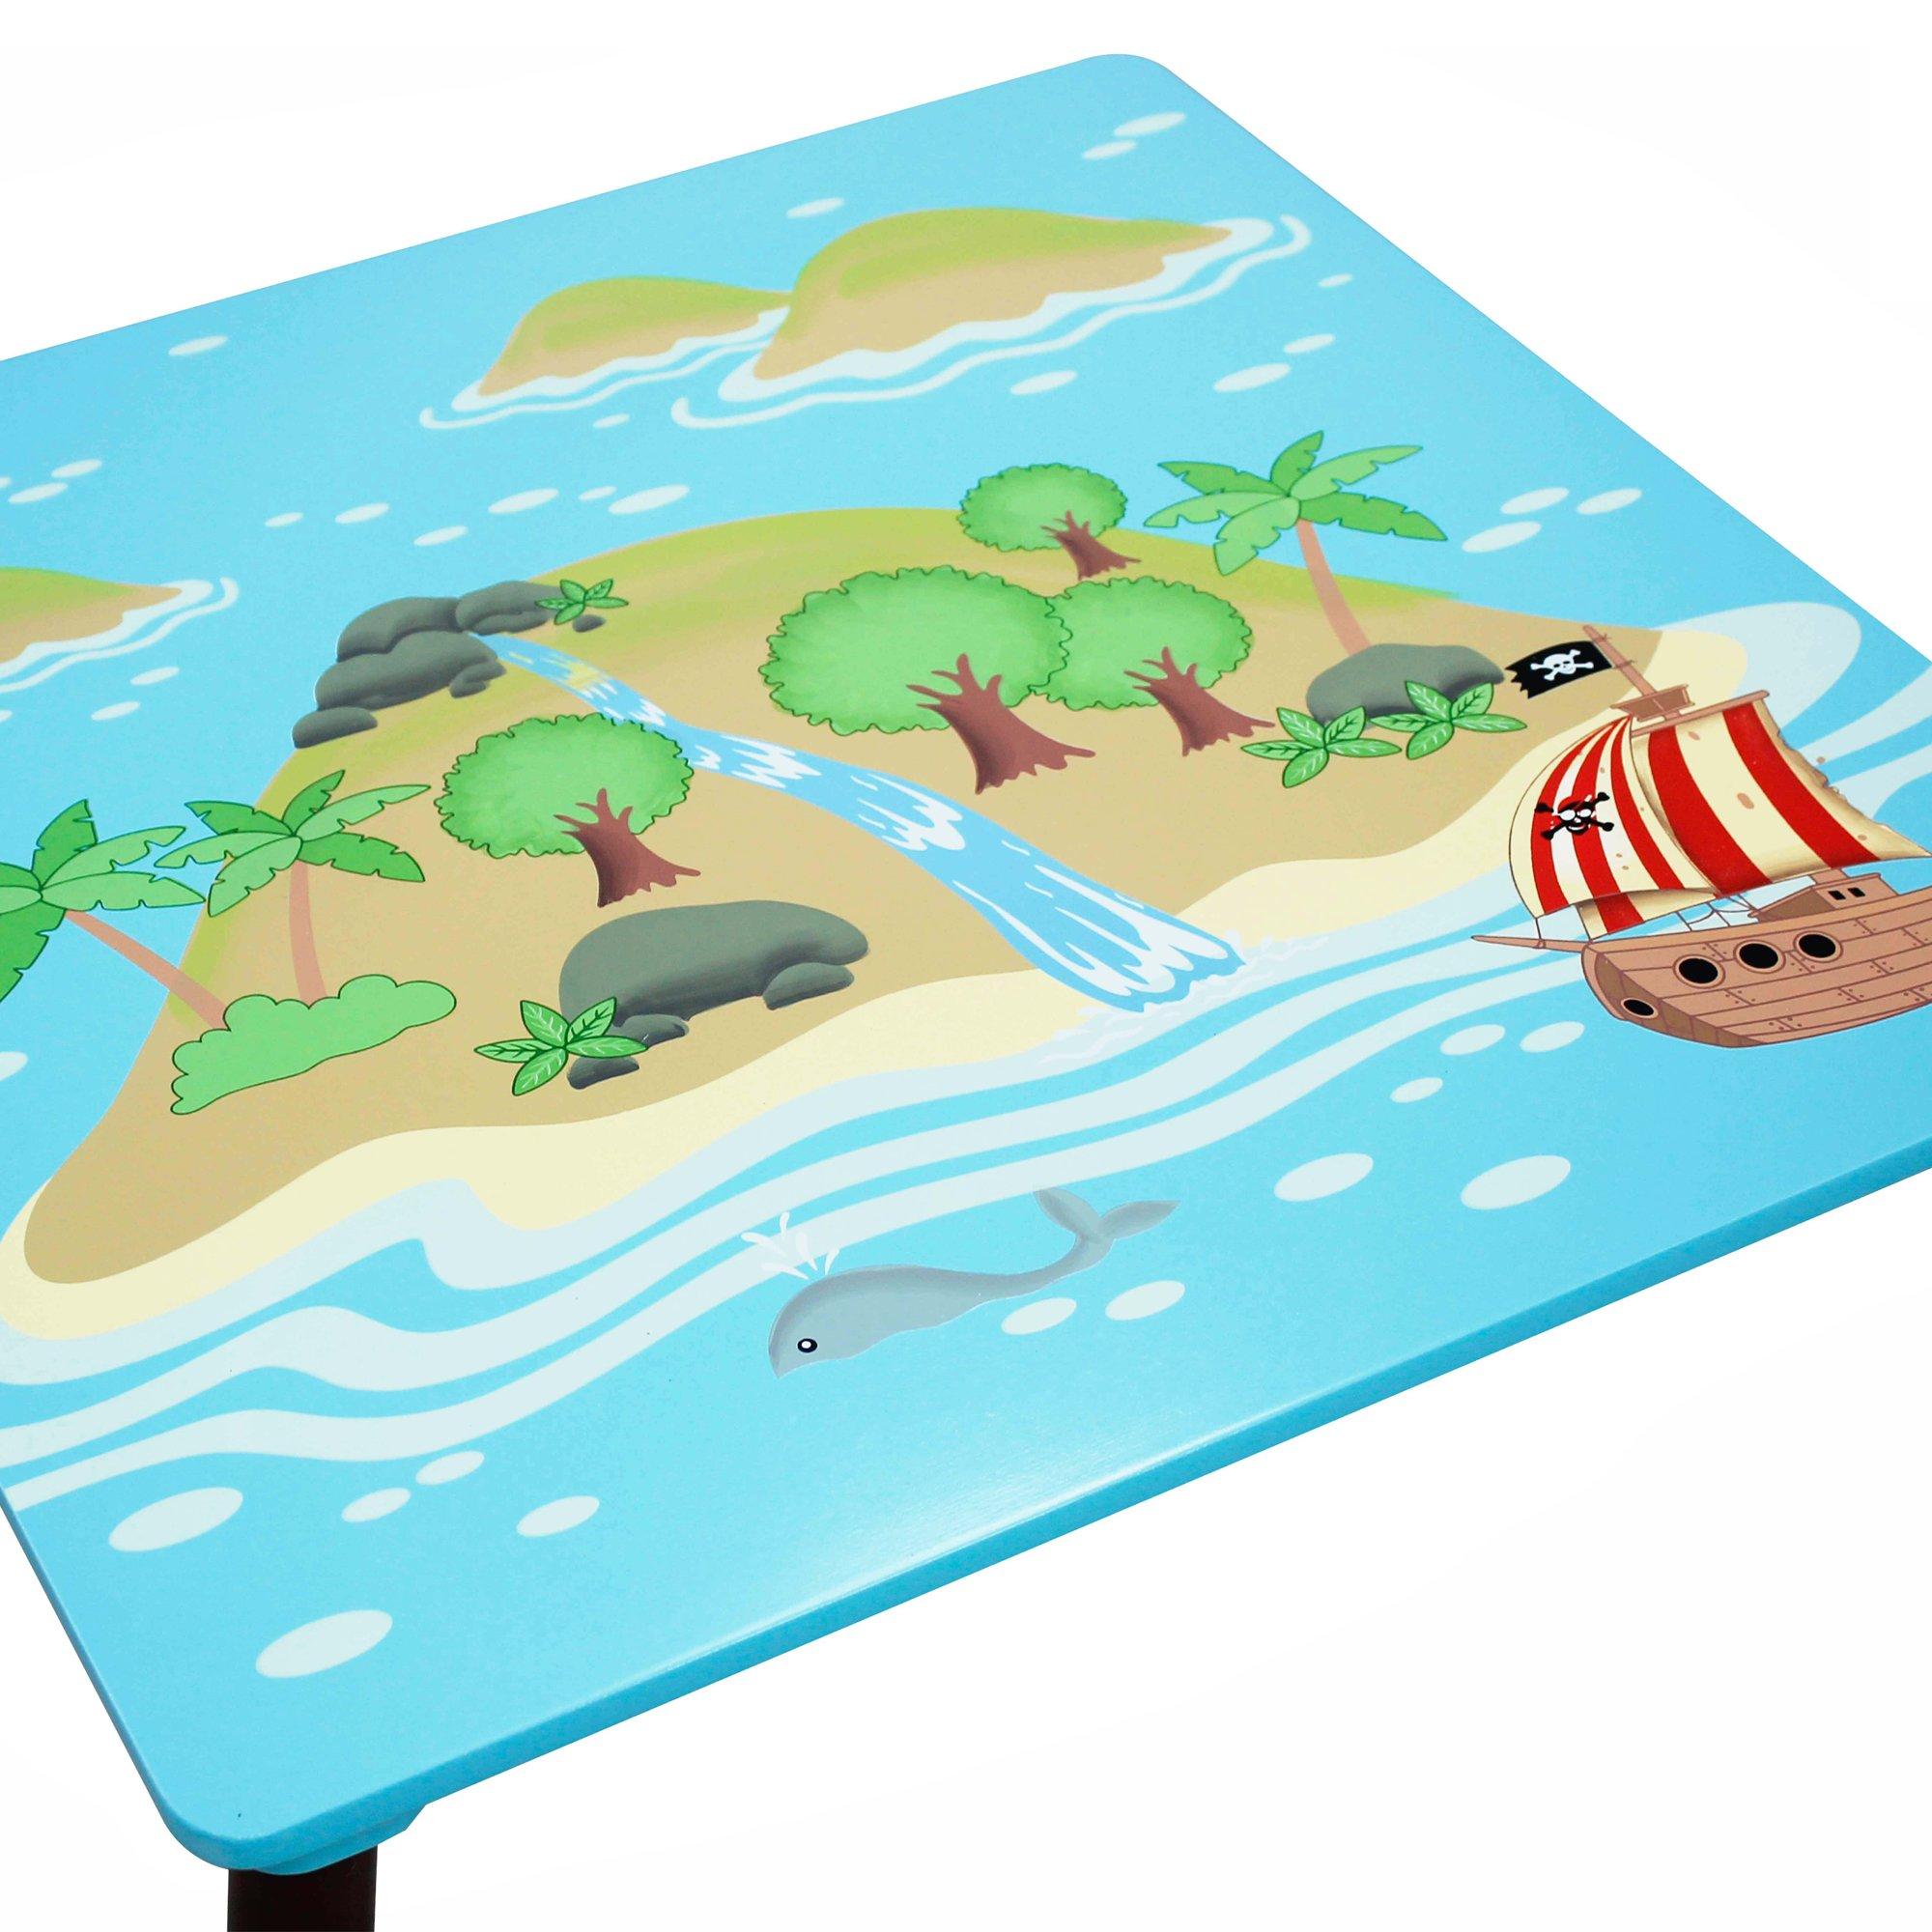 Sandy Beach clipart pirate island Fantasy Island Pirates Fields Fields